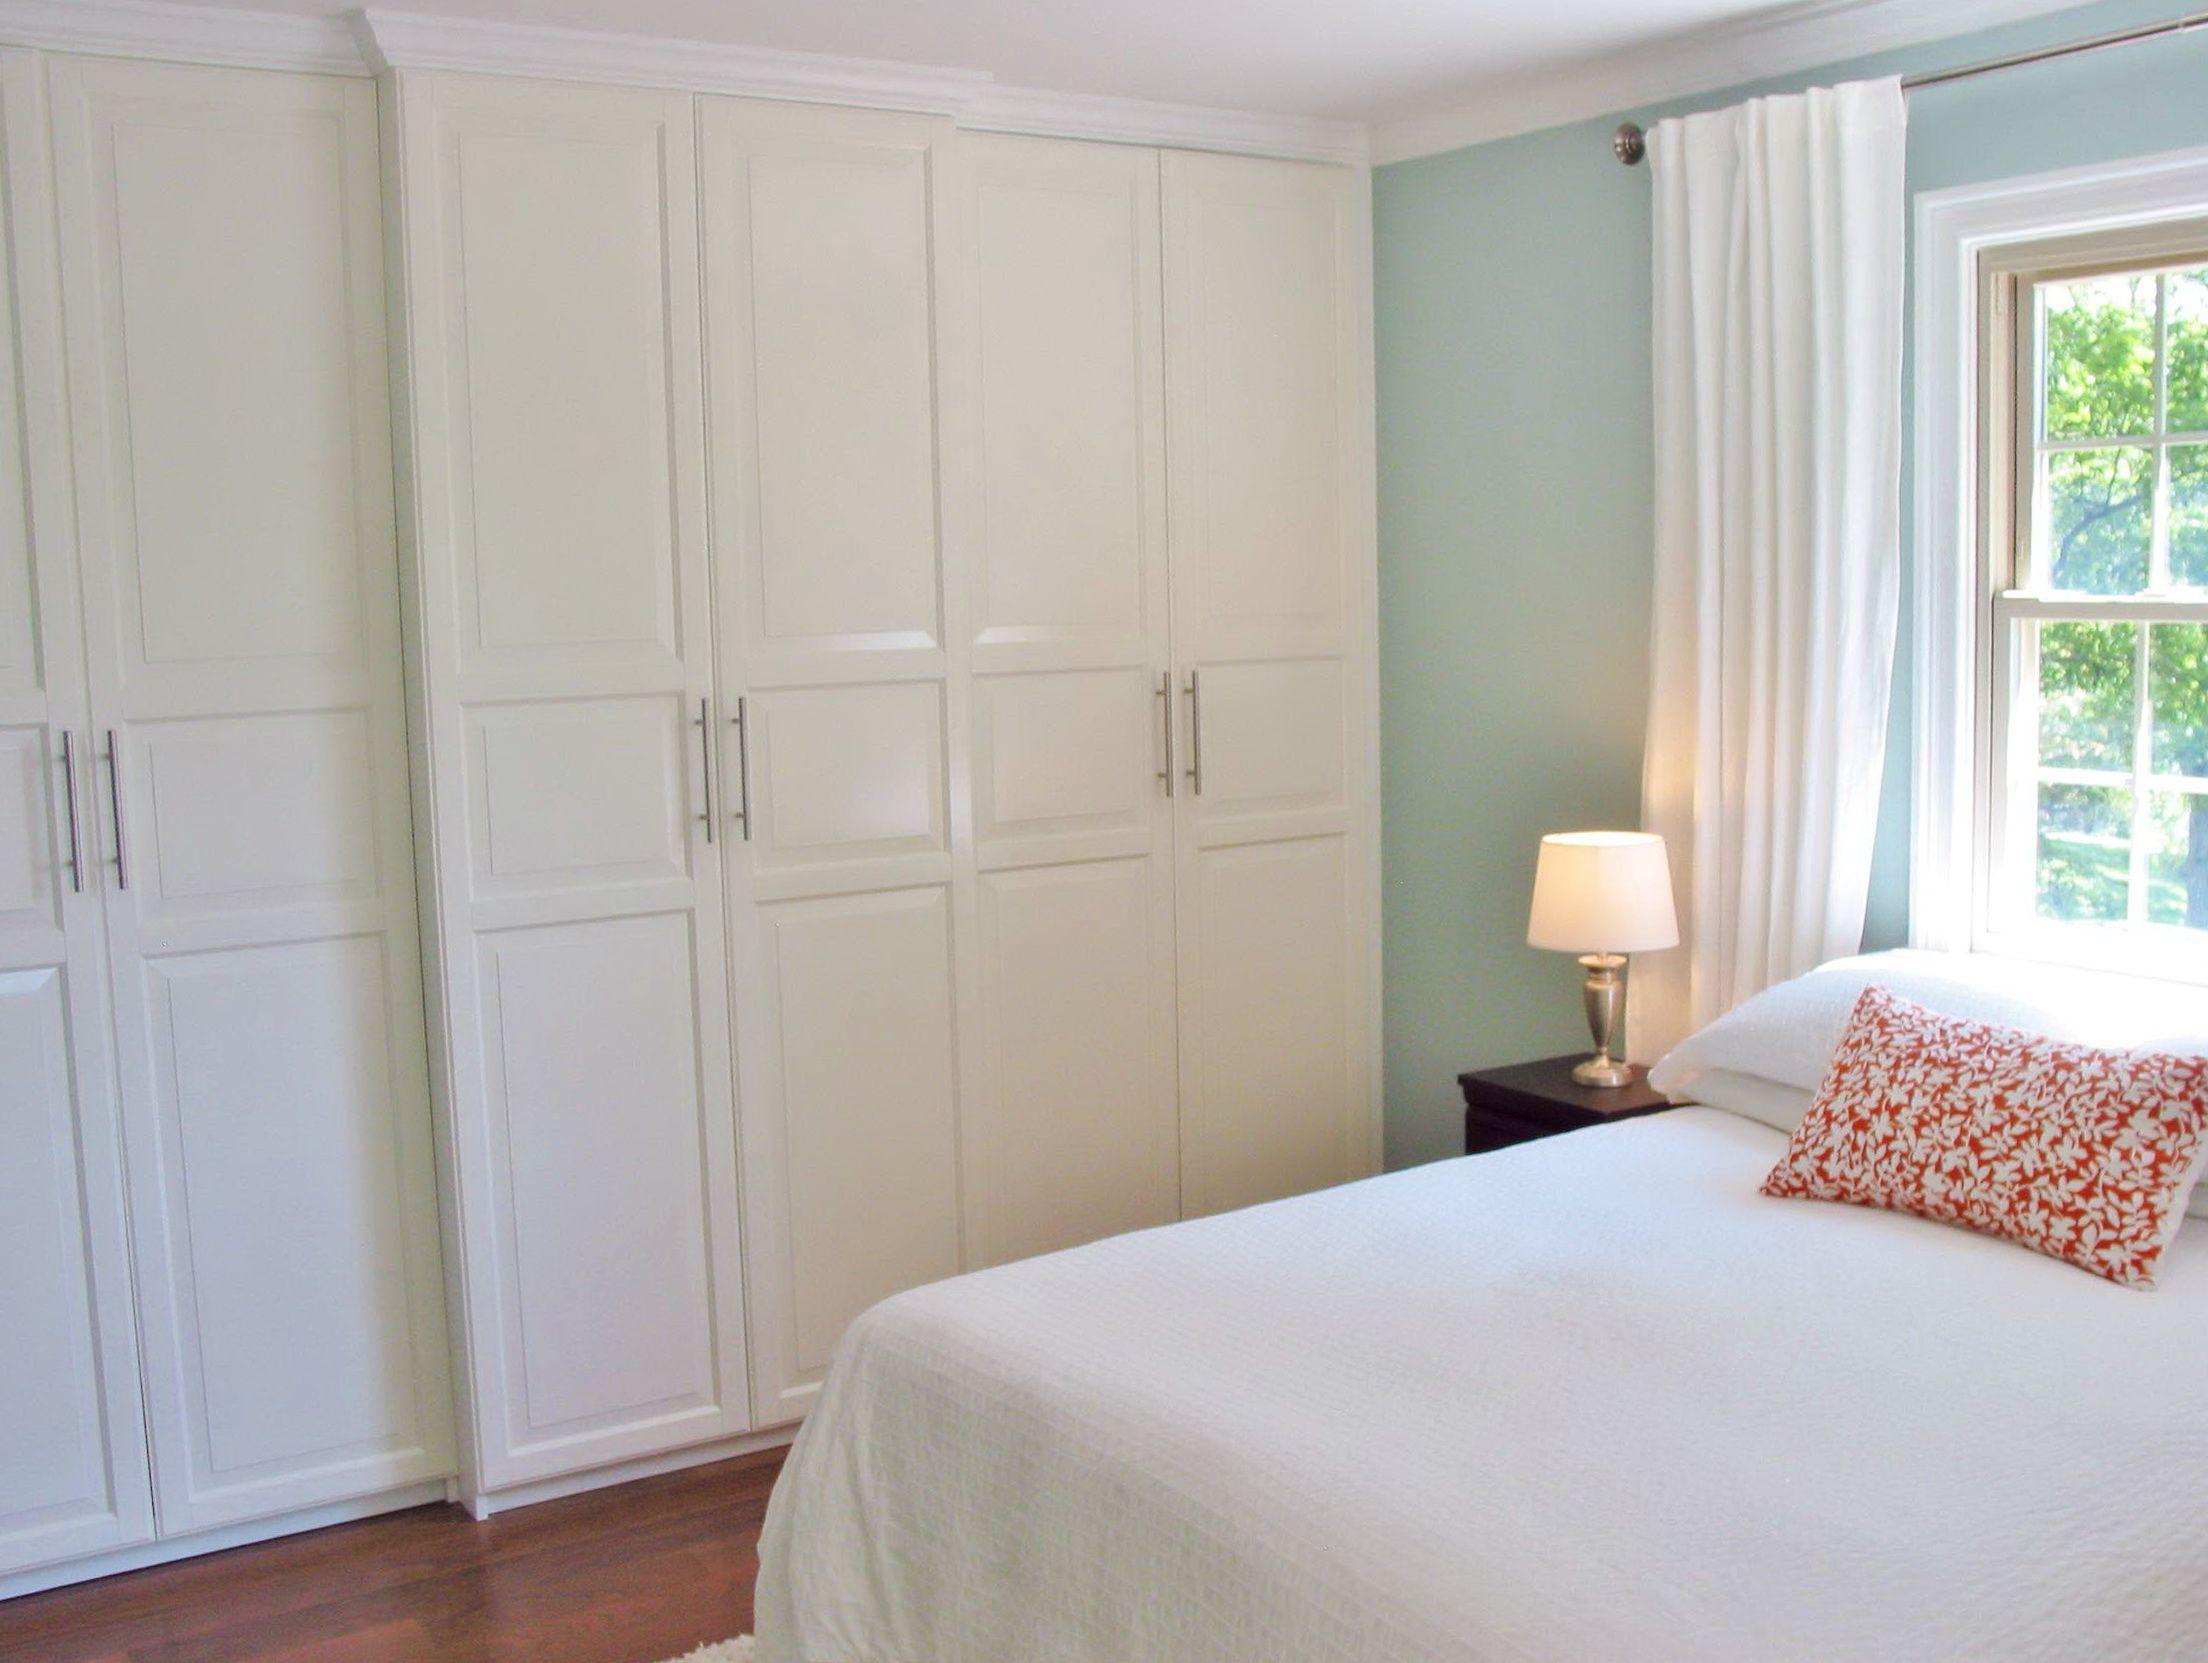 Bedroom Closet Ideas Interior Design Ideas With Regard To Master Bedroom Closet Des Small Bedroom Closet Design Small Master Bedroom Closet Ideas Small Bedroom